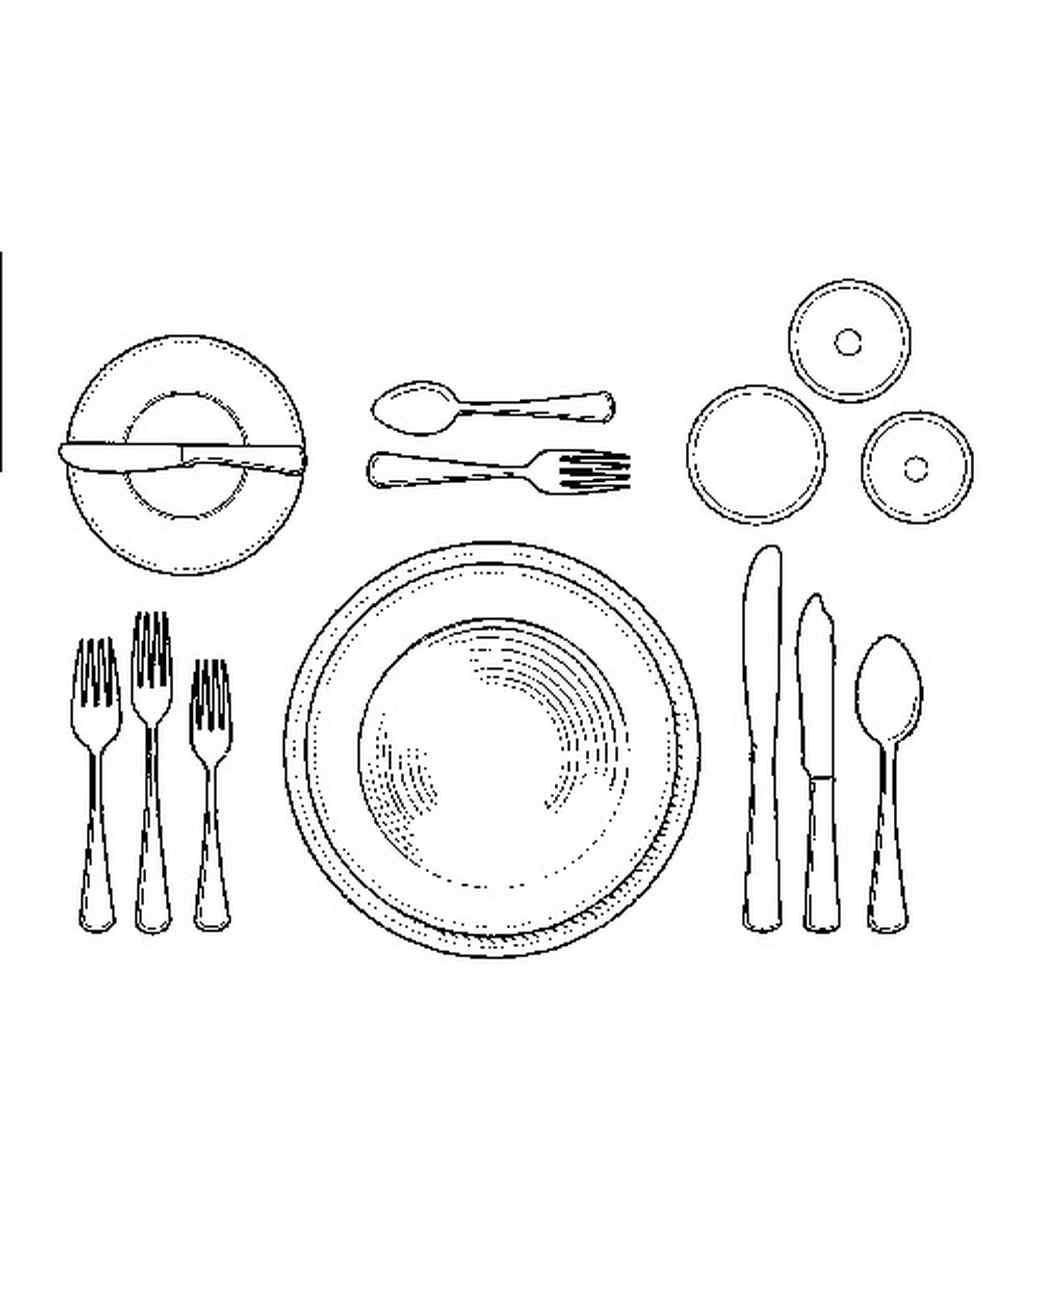 Proper table setting diagram diagram of a formal table setting - Setting The Table For Soup